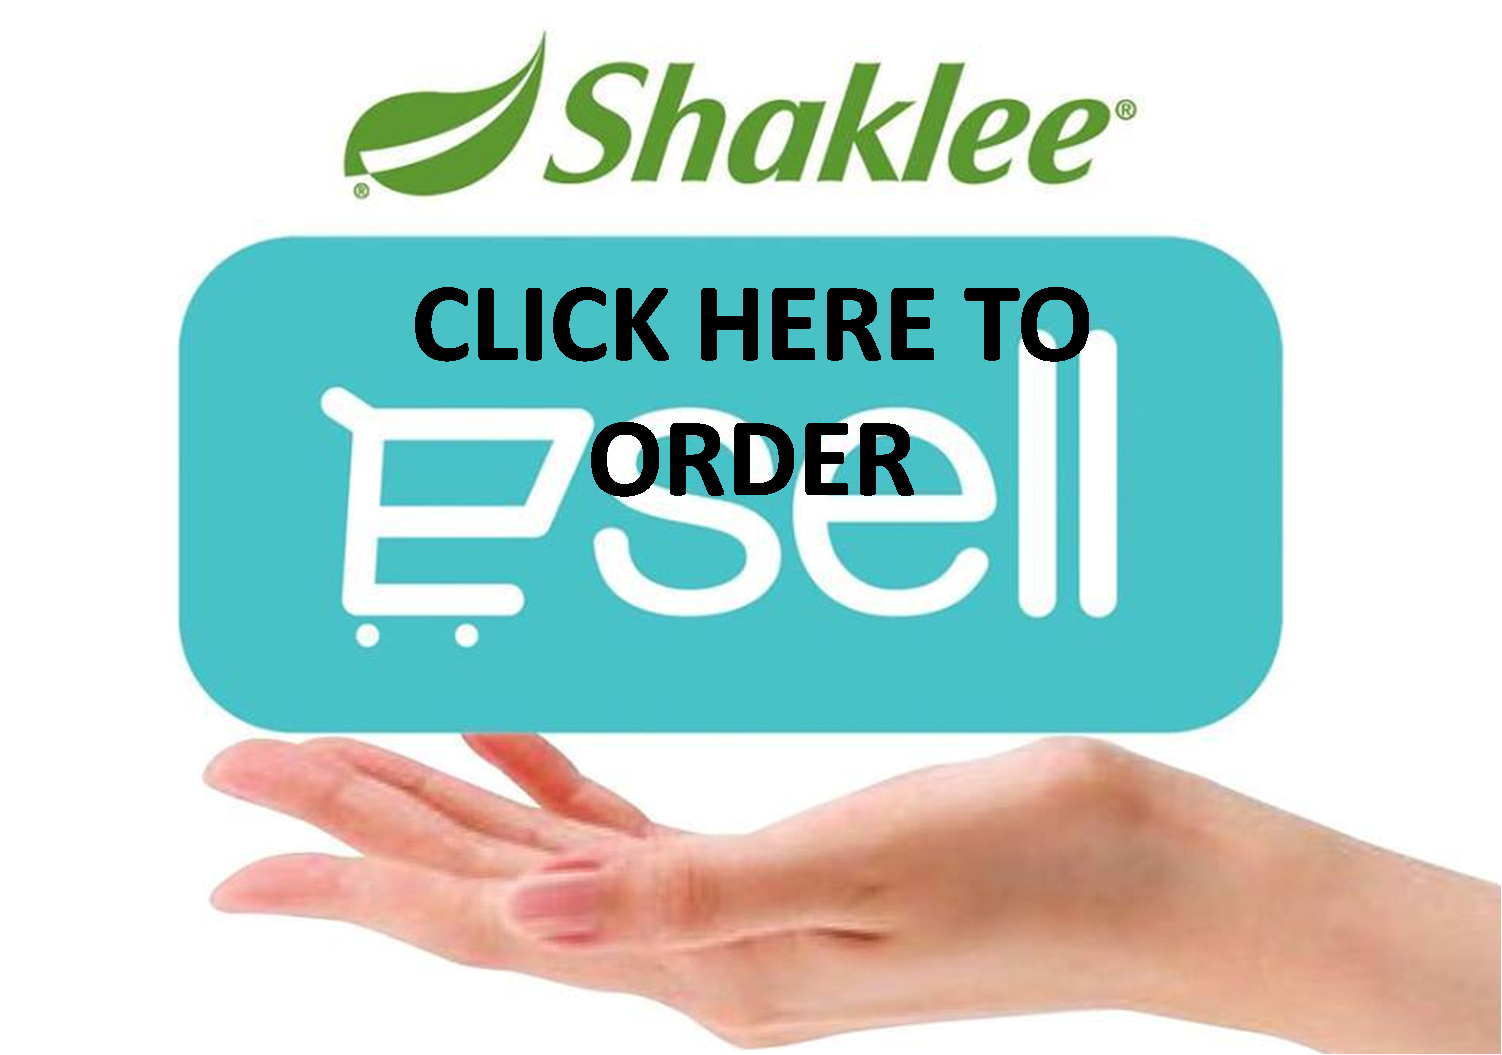 https://www.shaklee2u.com.my/widget/widget_agreement.php?session_id=&enc_widget_id=b64bdf76ab9e818a9374f1a926e8663c